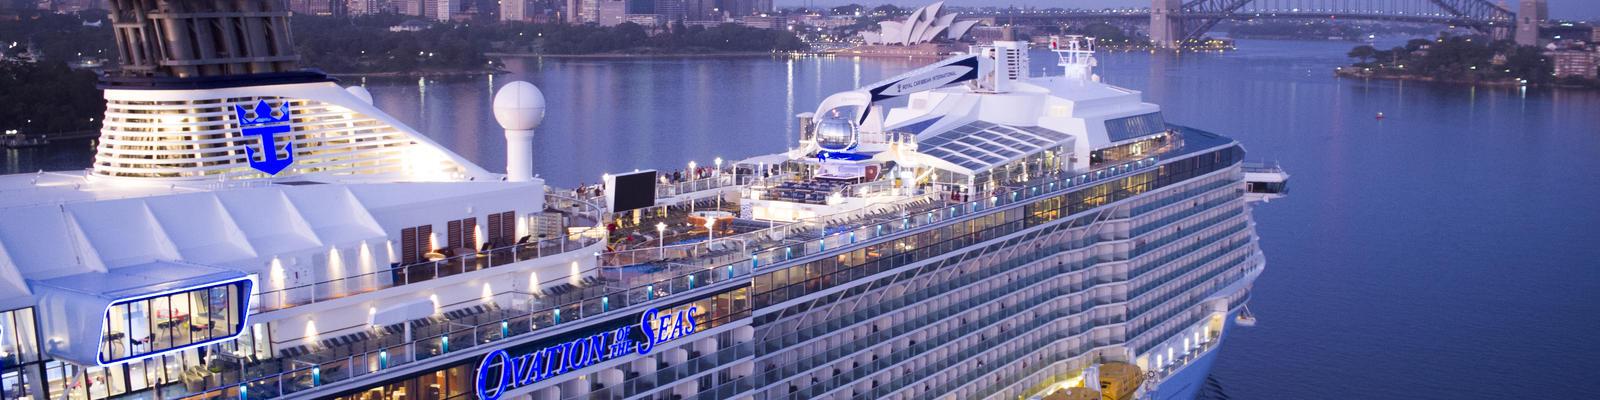 Ovation of the Seas (Photo: Royal Caribbean International)